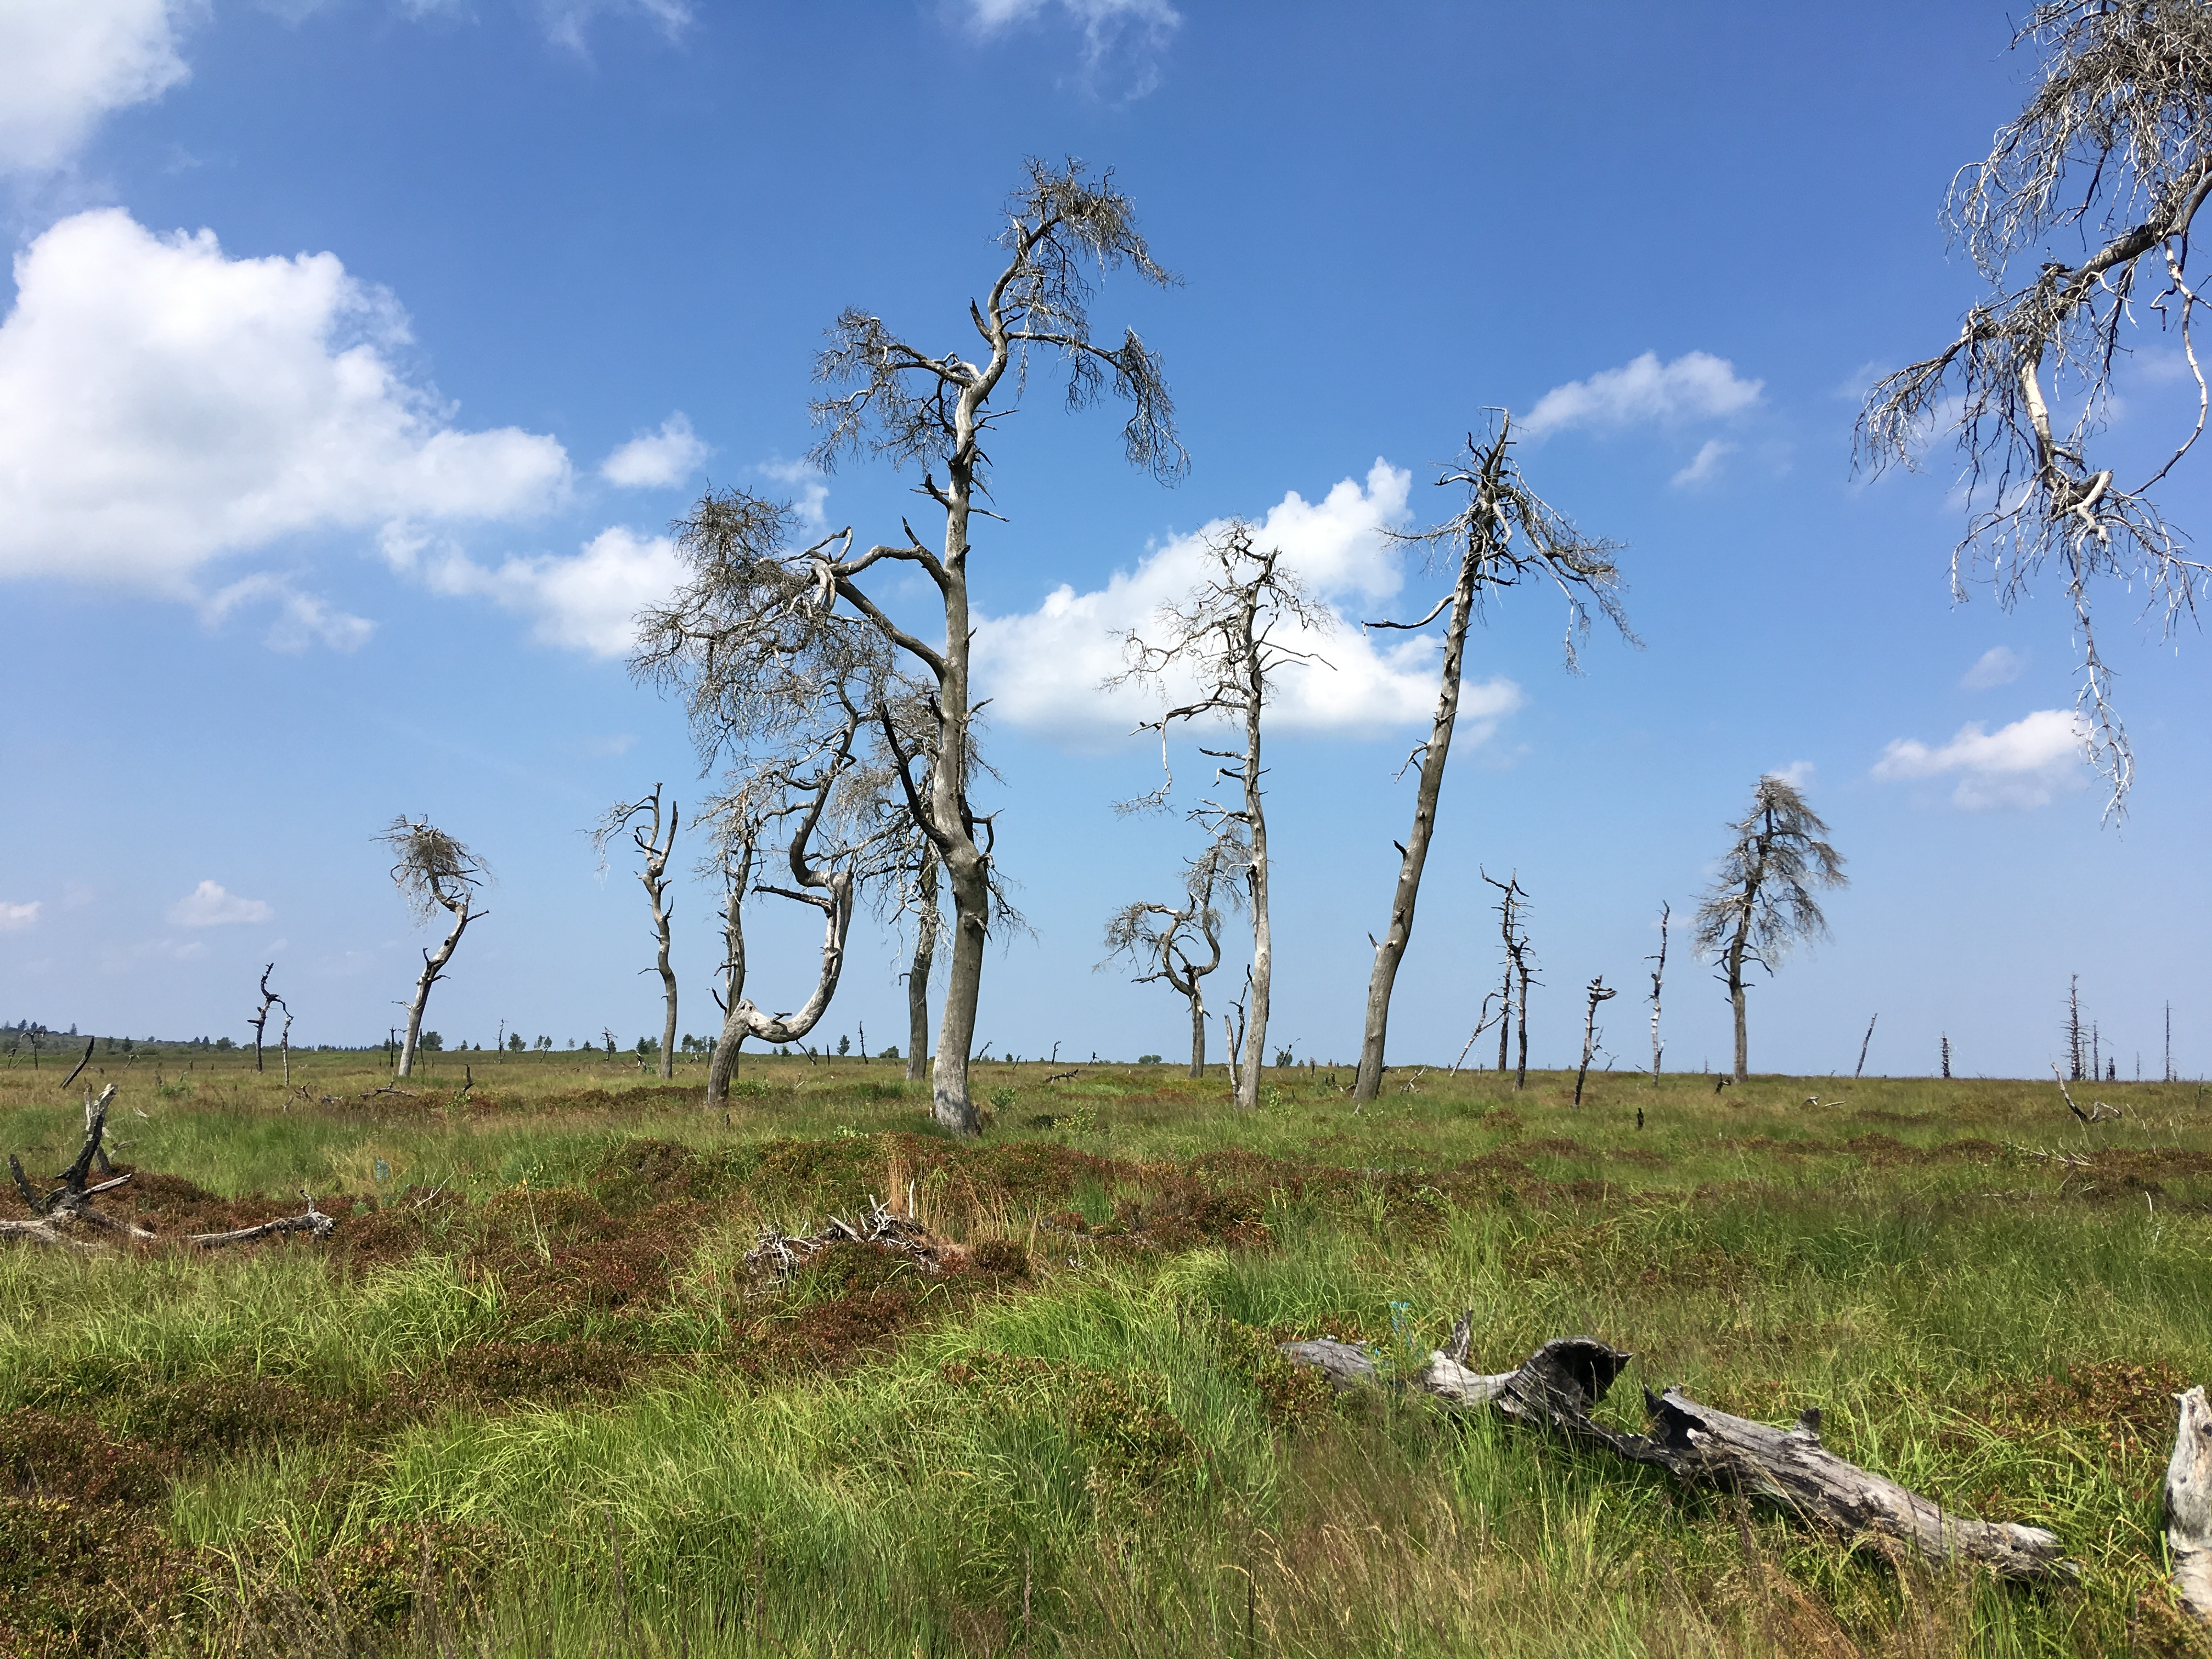 Das Hohe Venn – Wandern zu den toten Bäumen von Noir Flohay